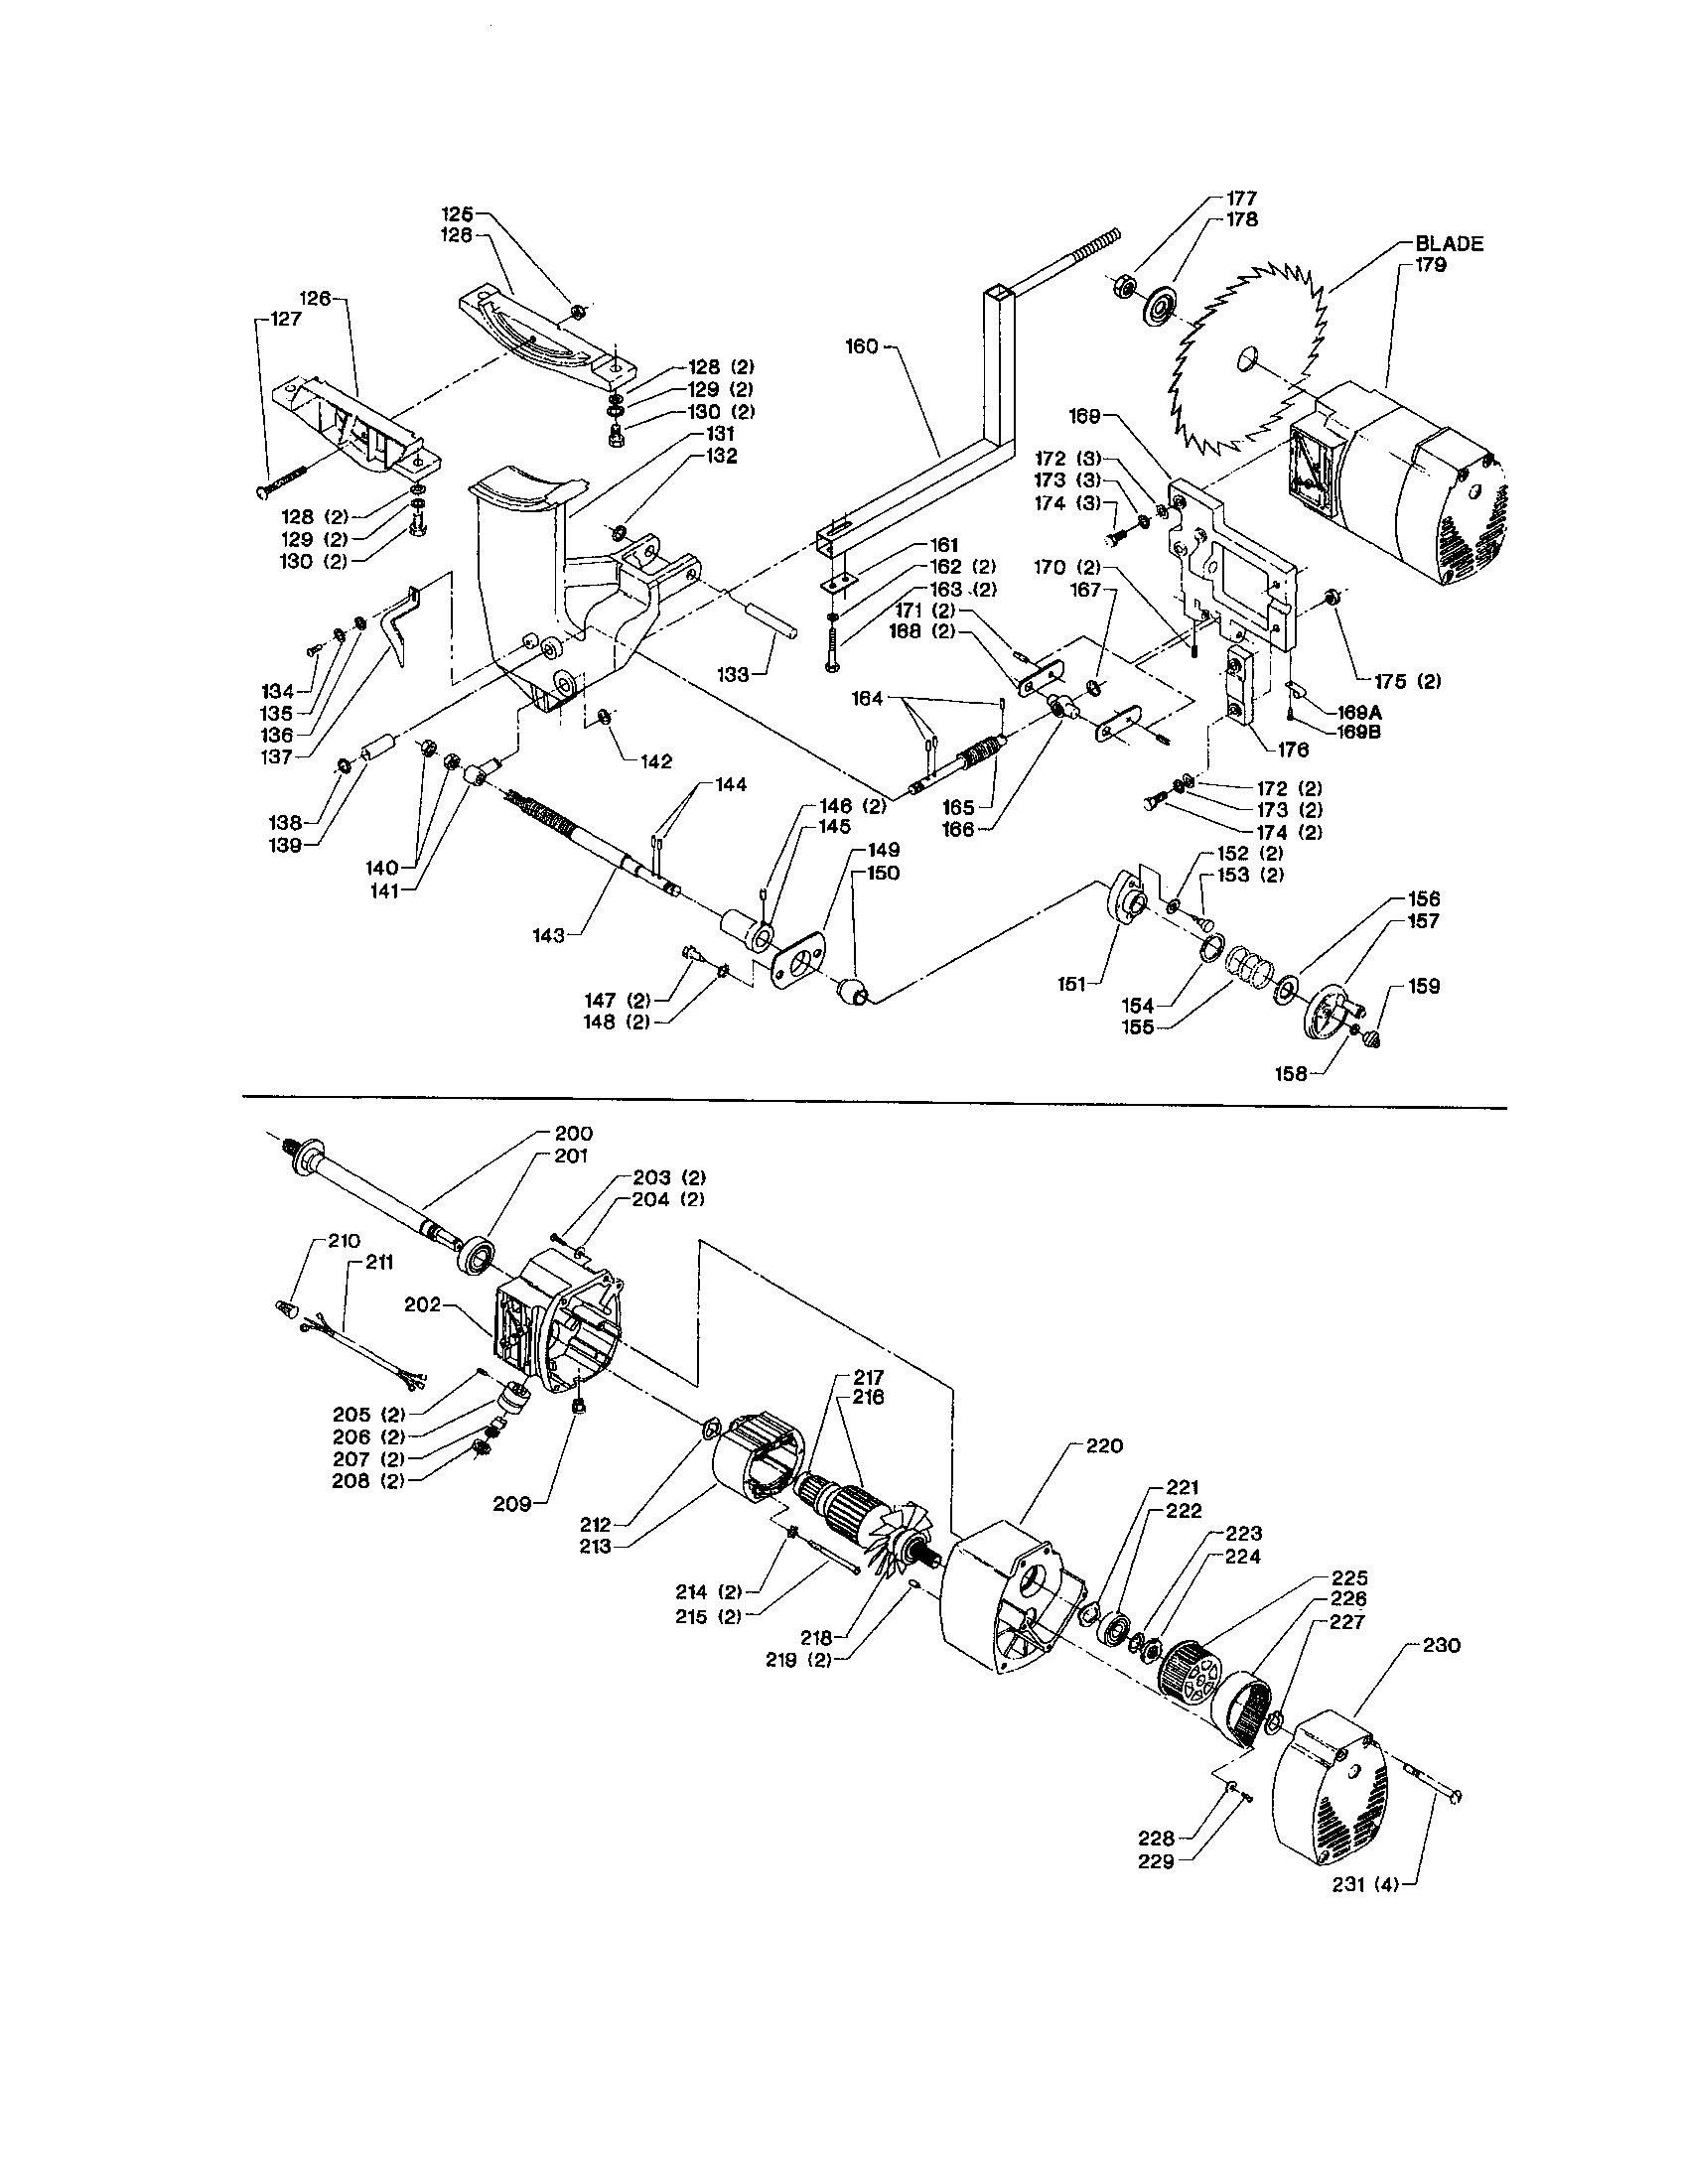 Delta model 36-600 table saw genuine parts